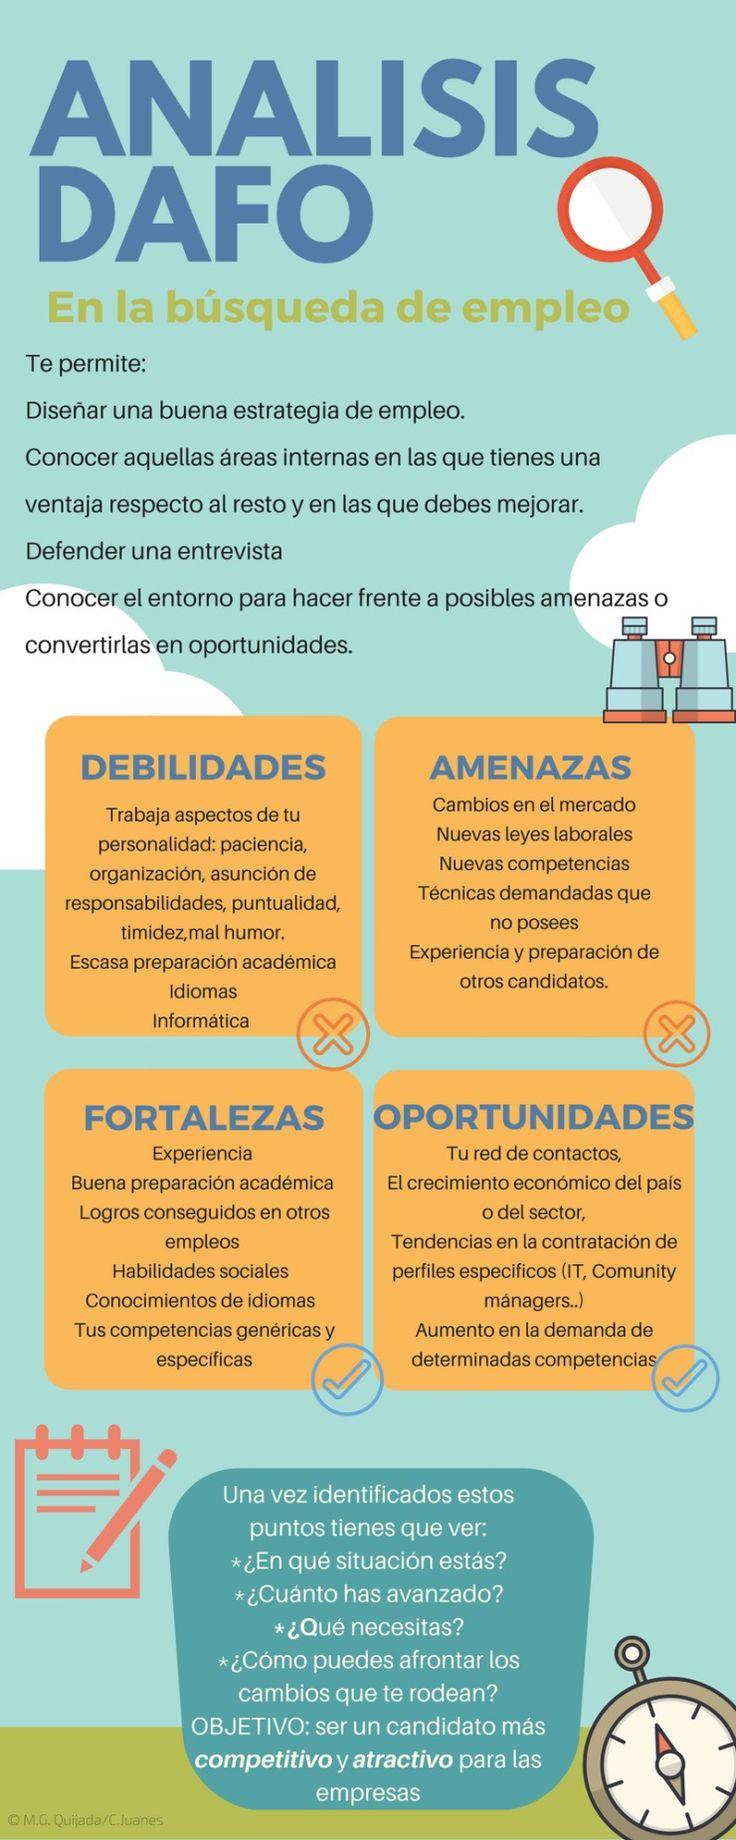 dafo-empleo-infografia.jpg (740×1850)